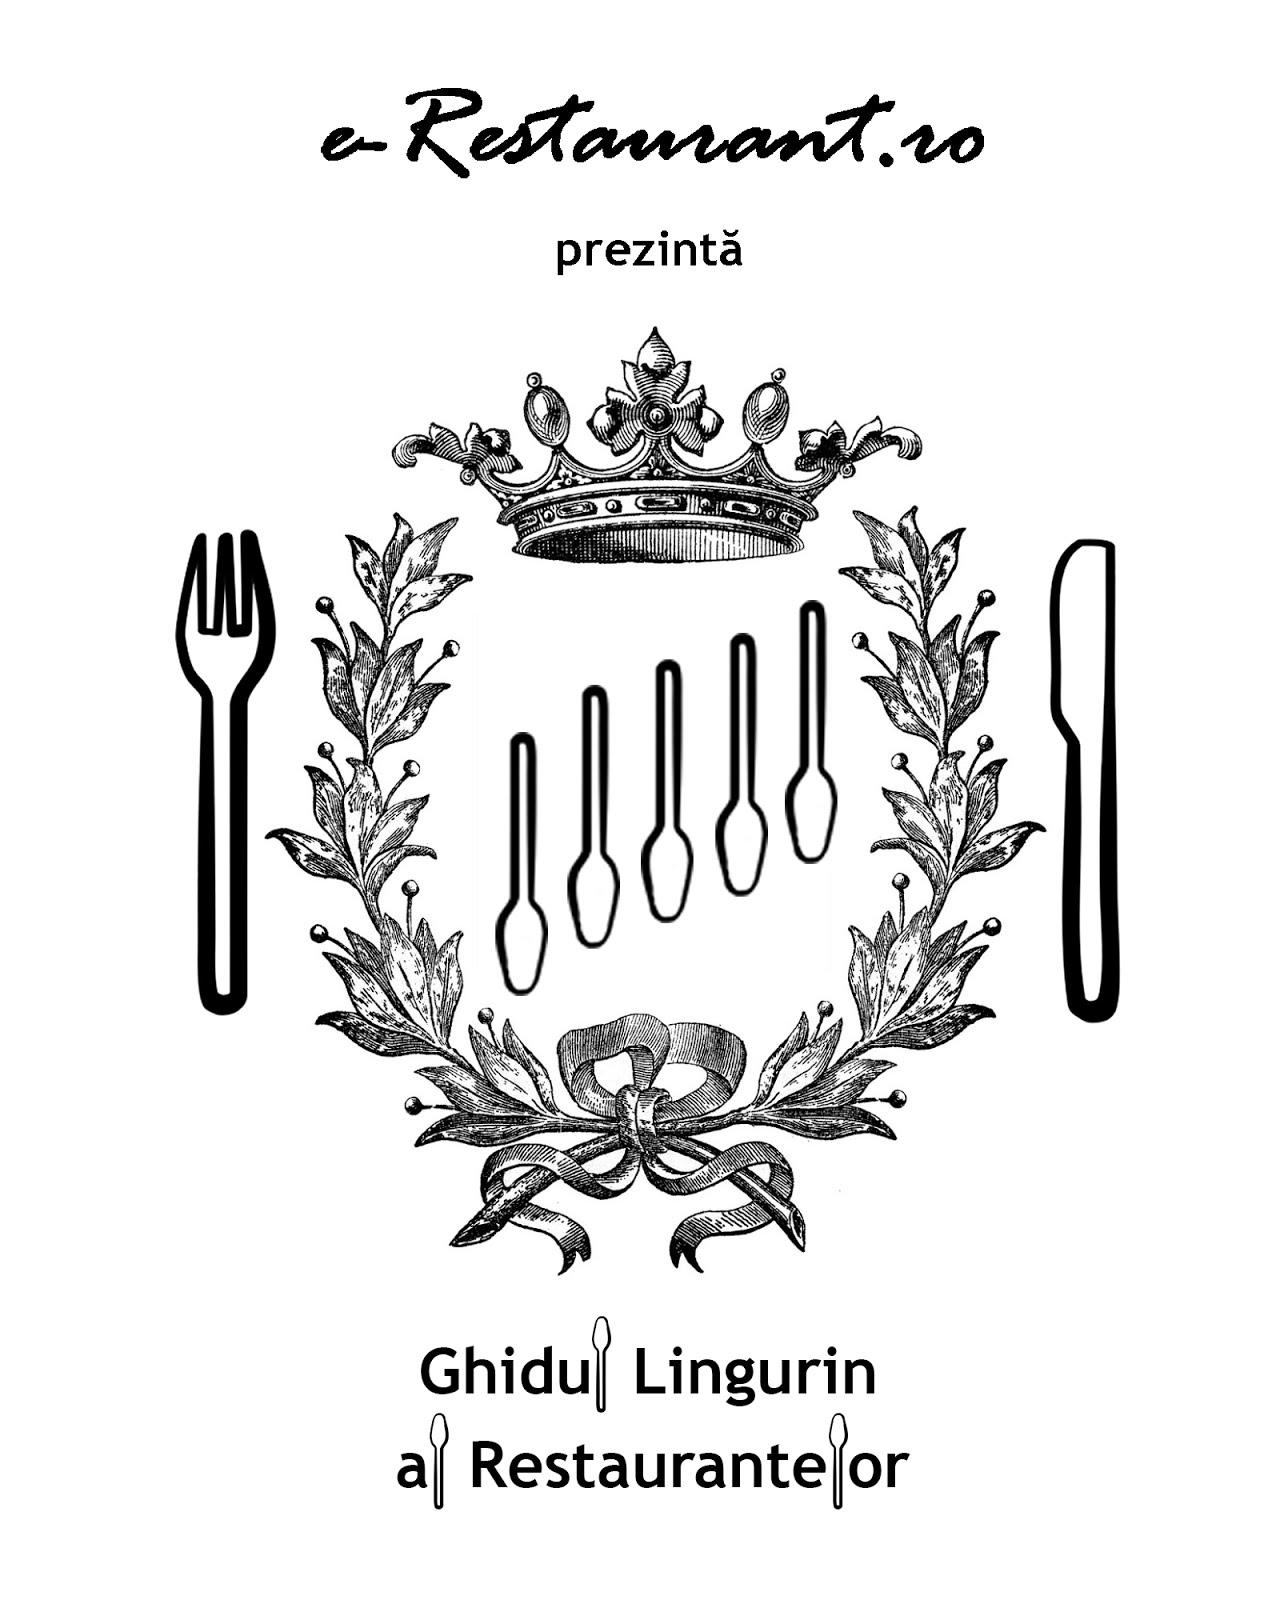 Ghidul Lingurin al Restaurantelor din România: